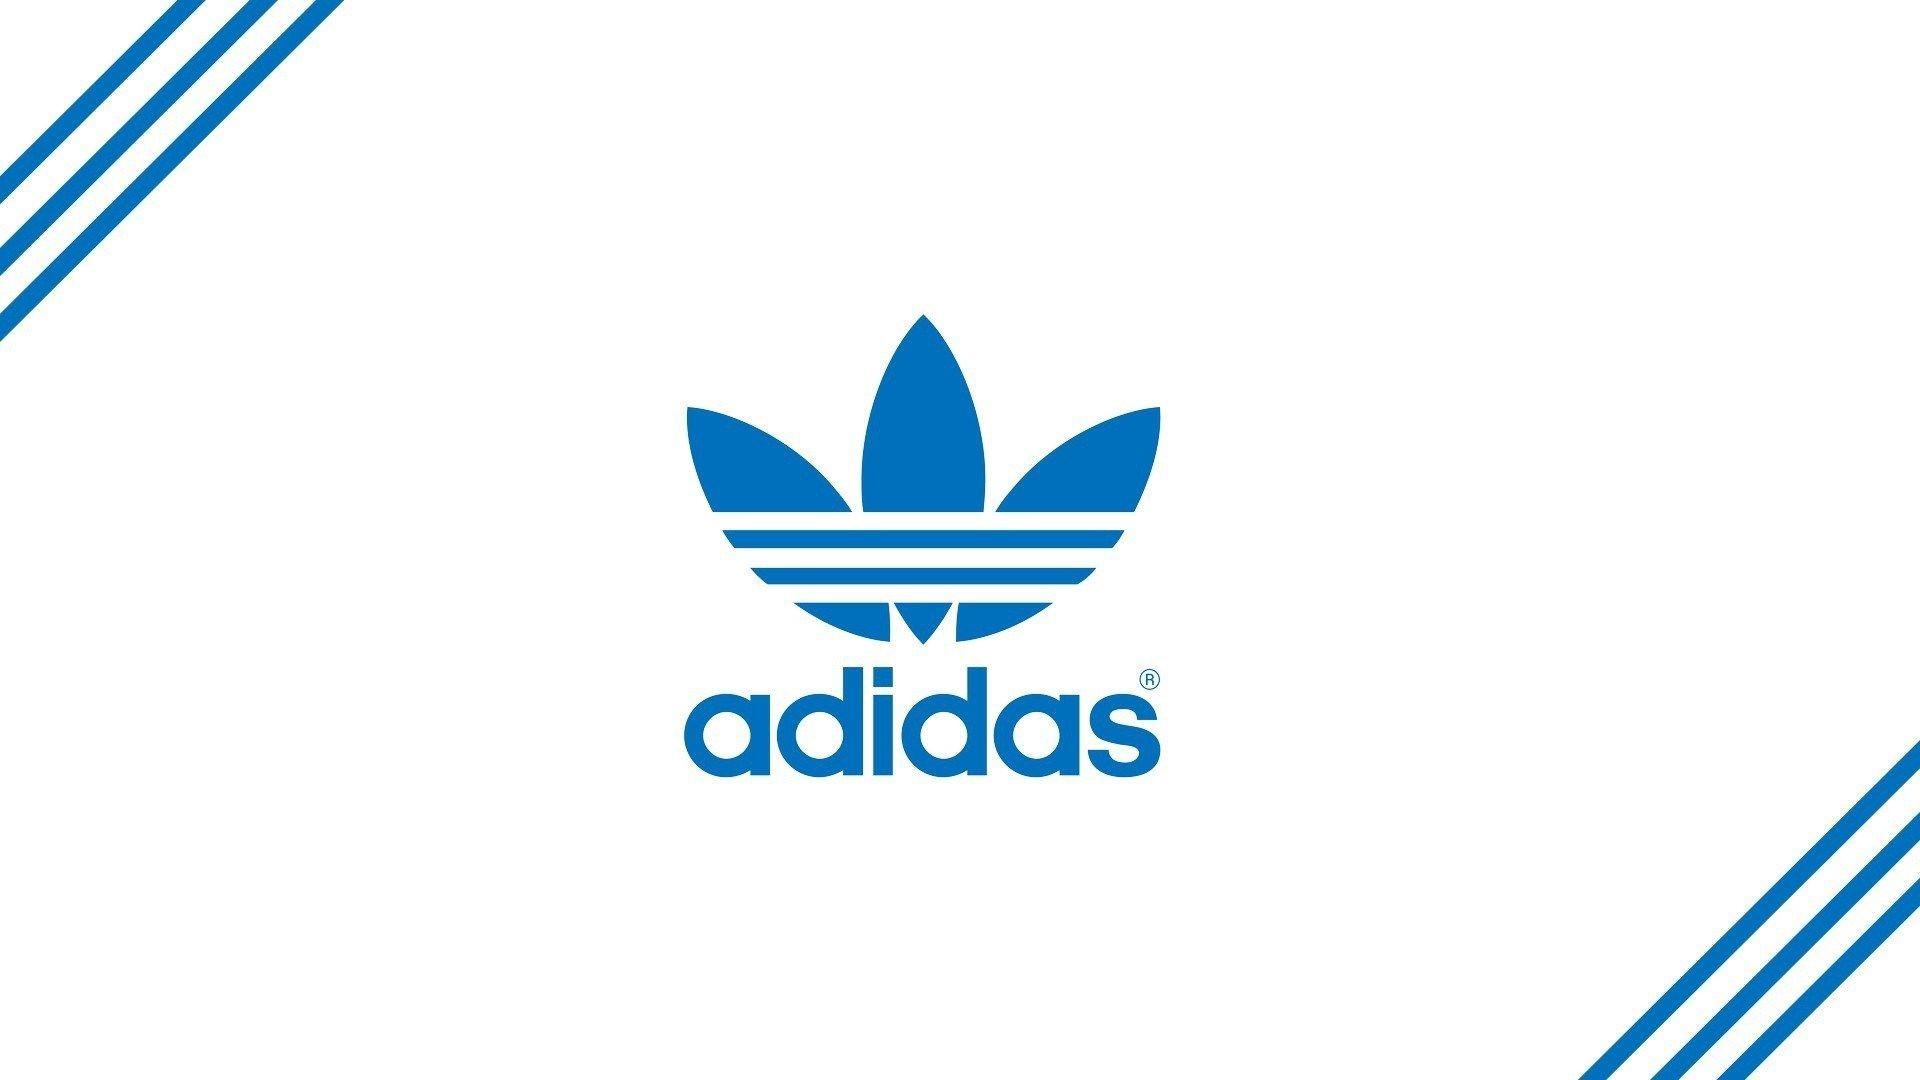 wallpaper adidas, adidas wallpaper